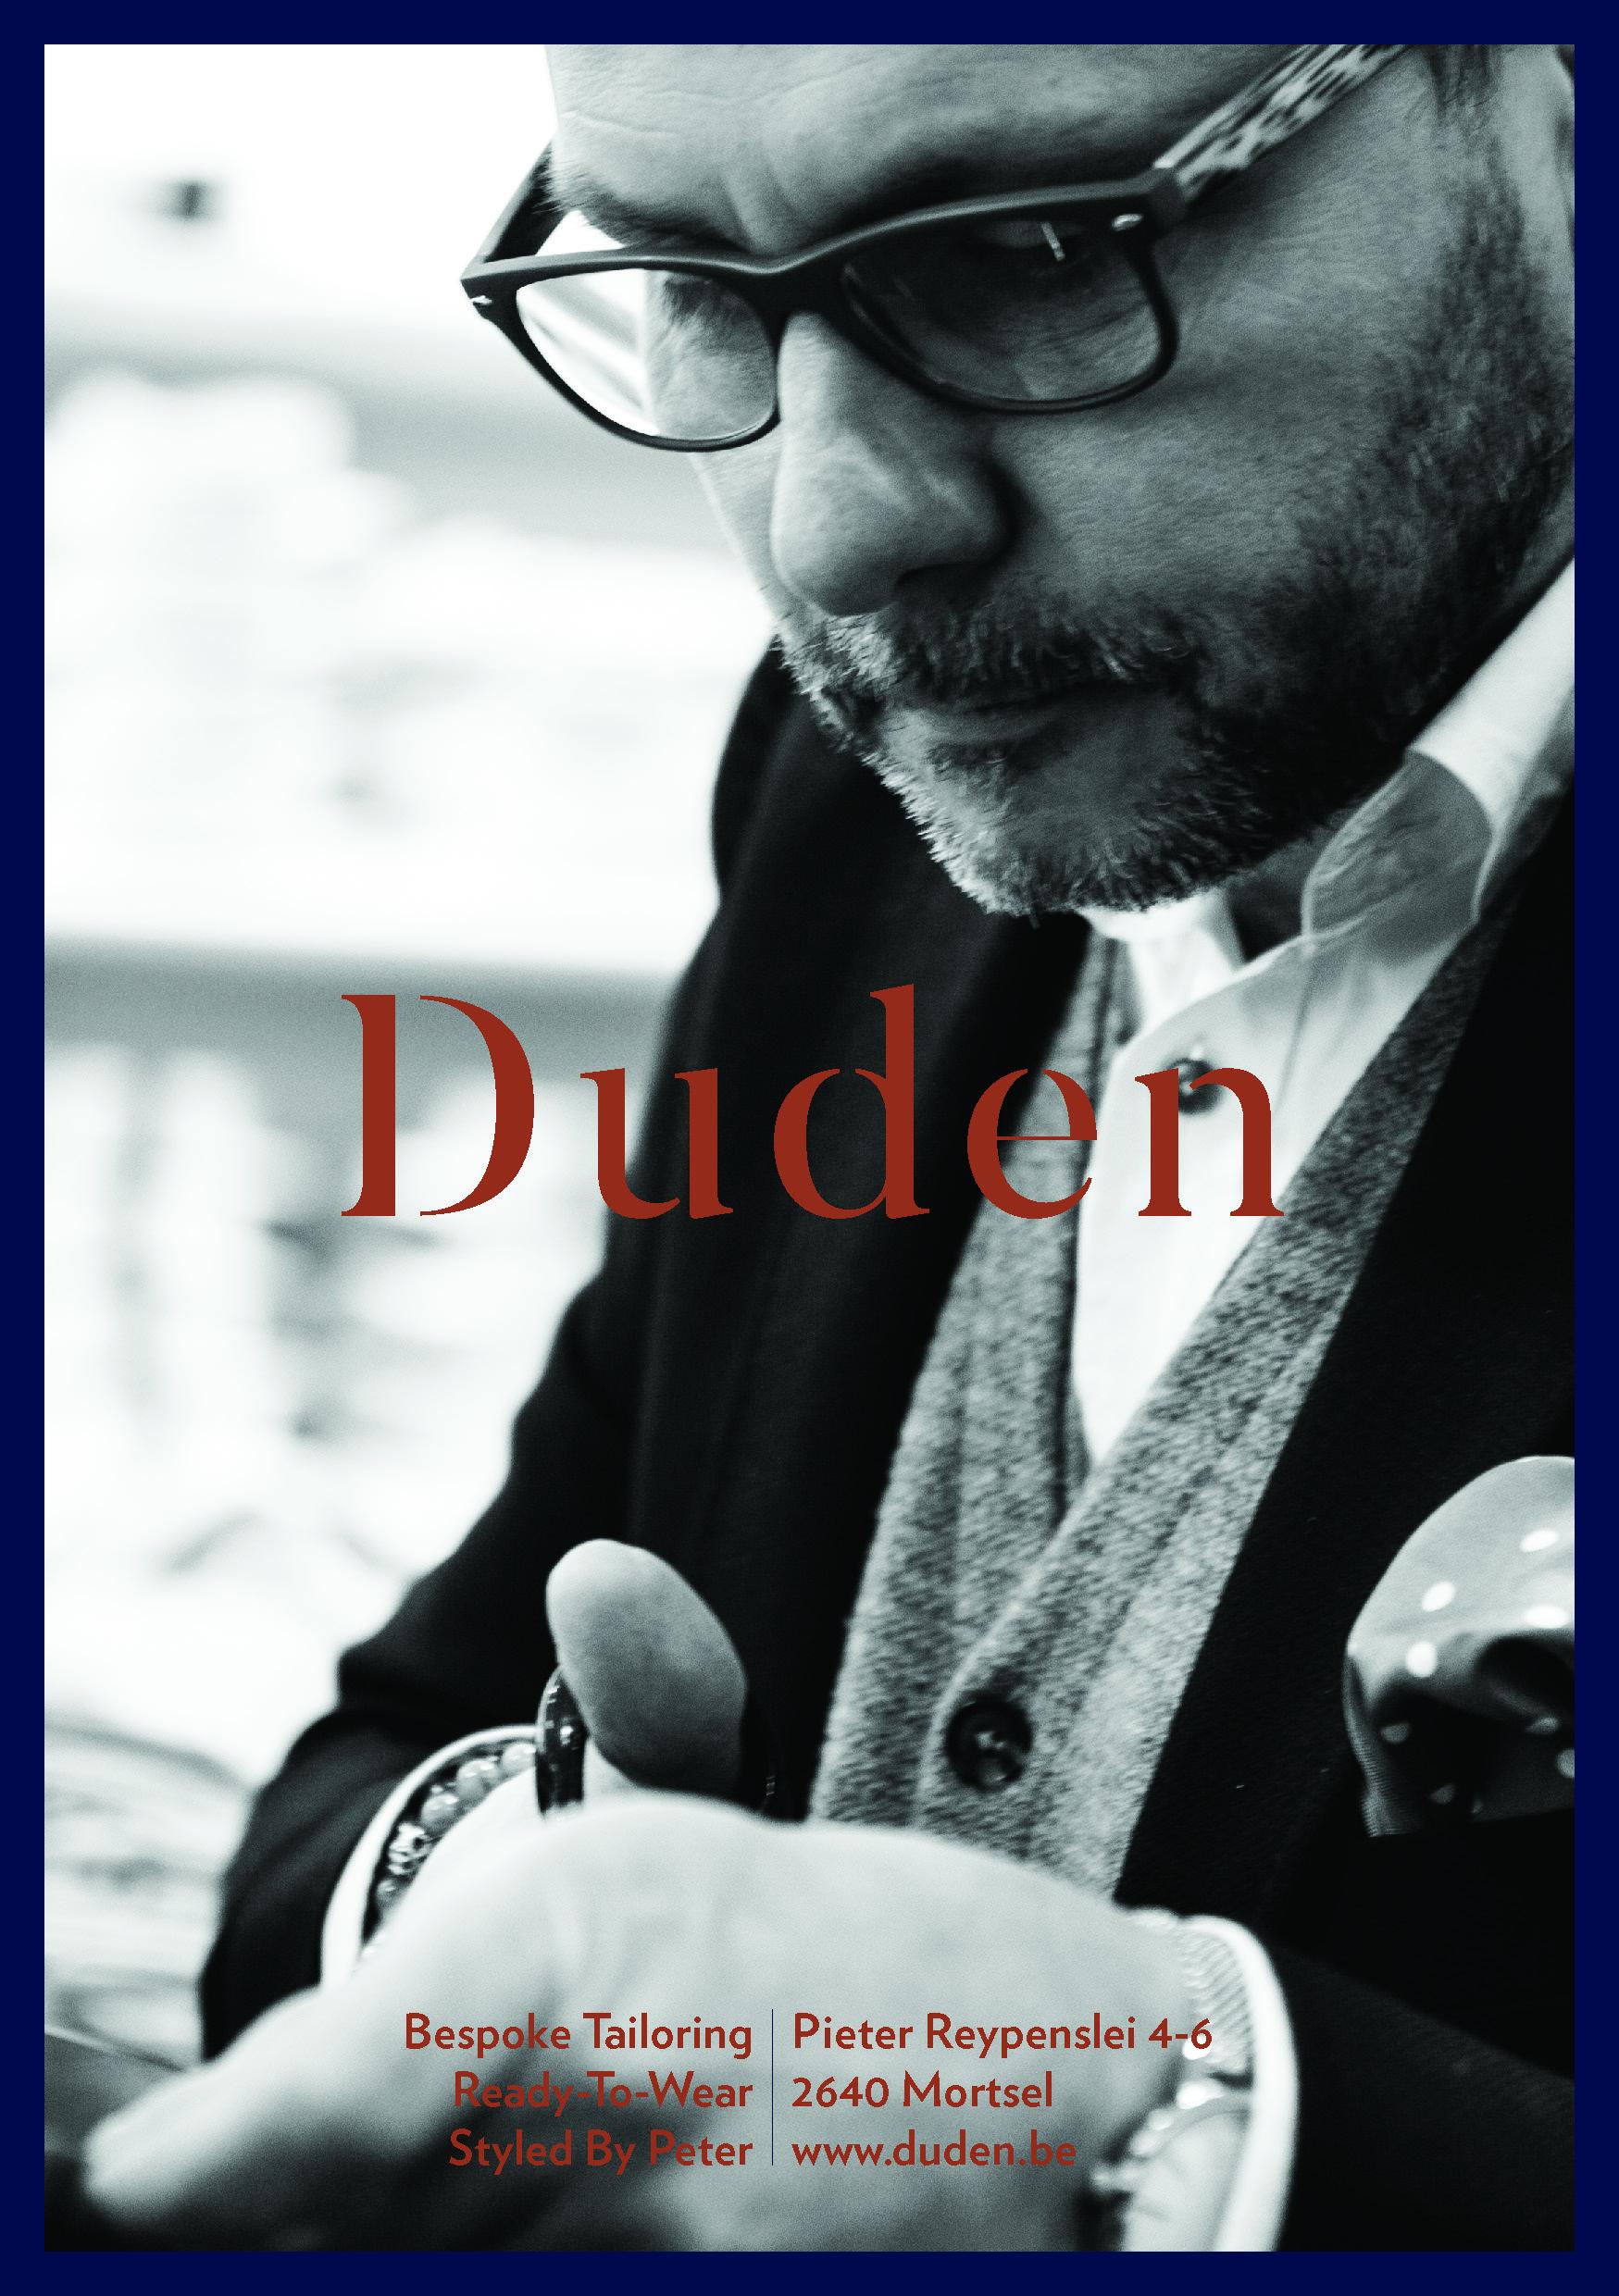 DUDEN-GRAPHIC-A5ADv250218.jpg